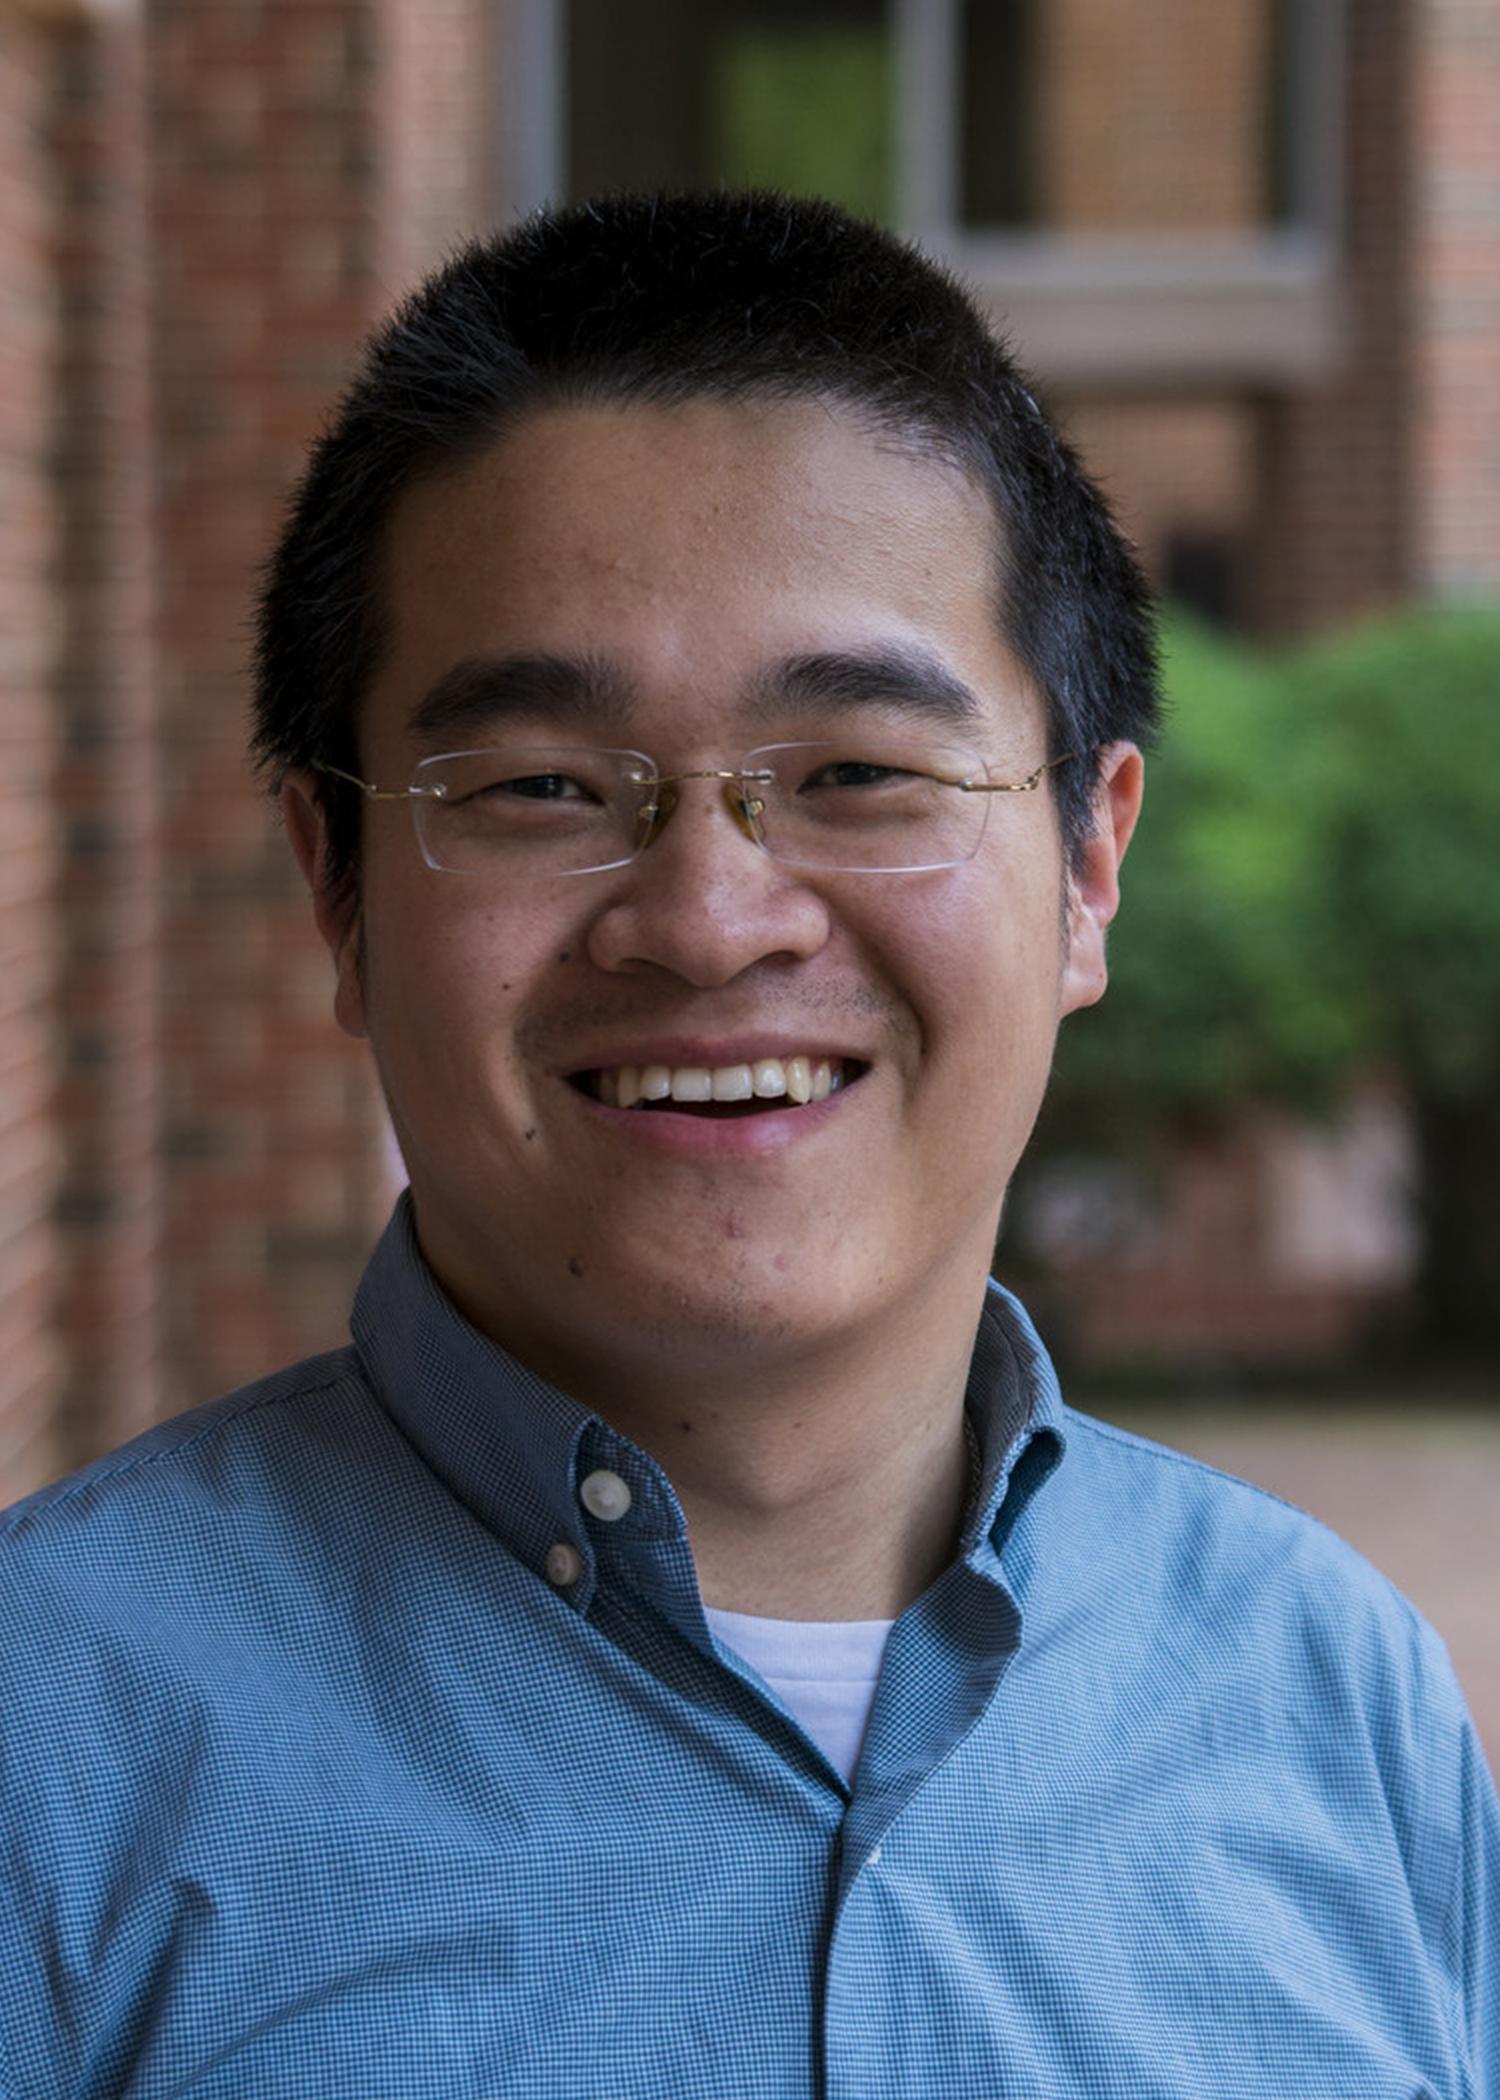 Profile picture of Yunzhi Hu